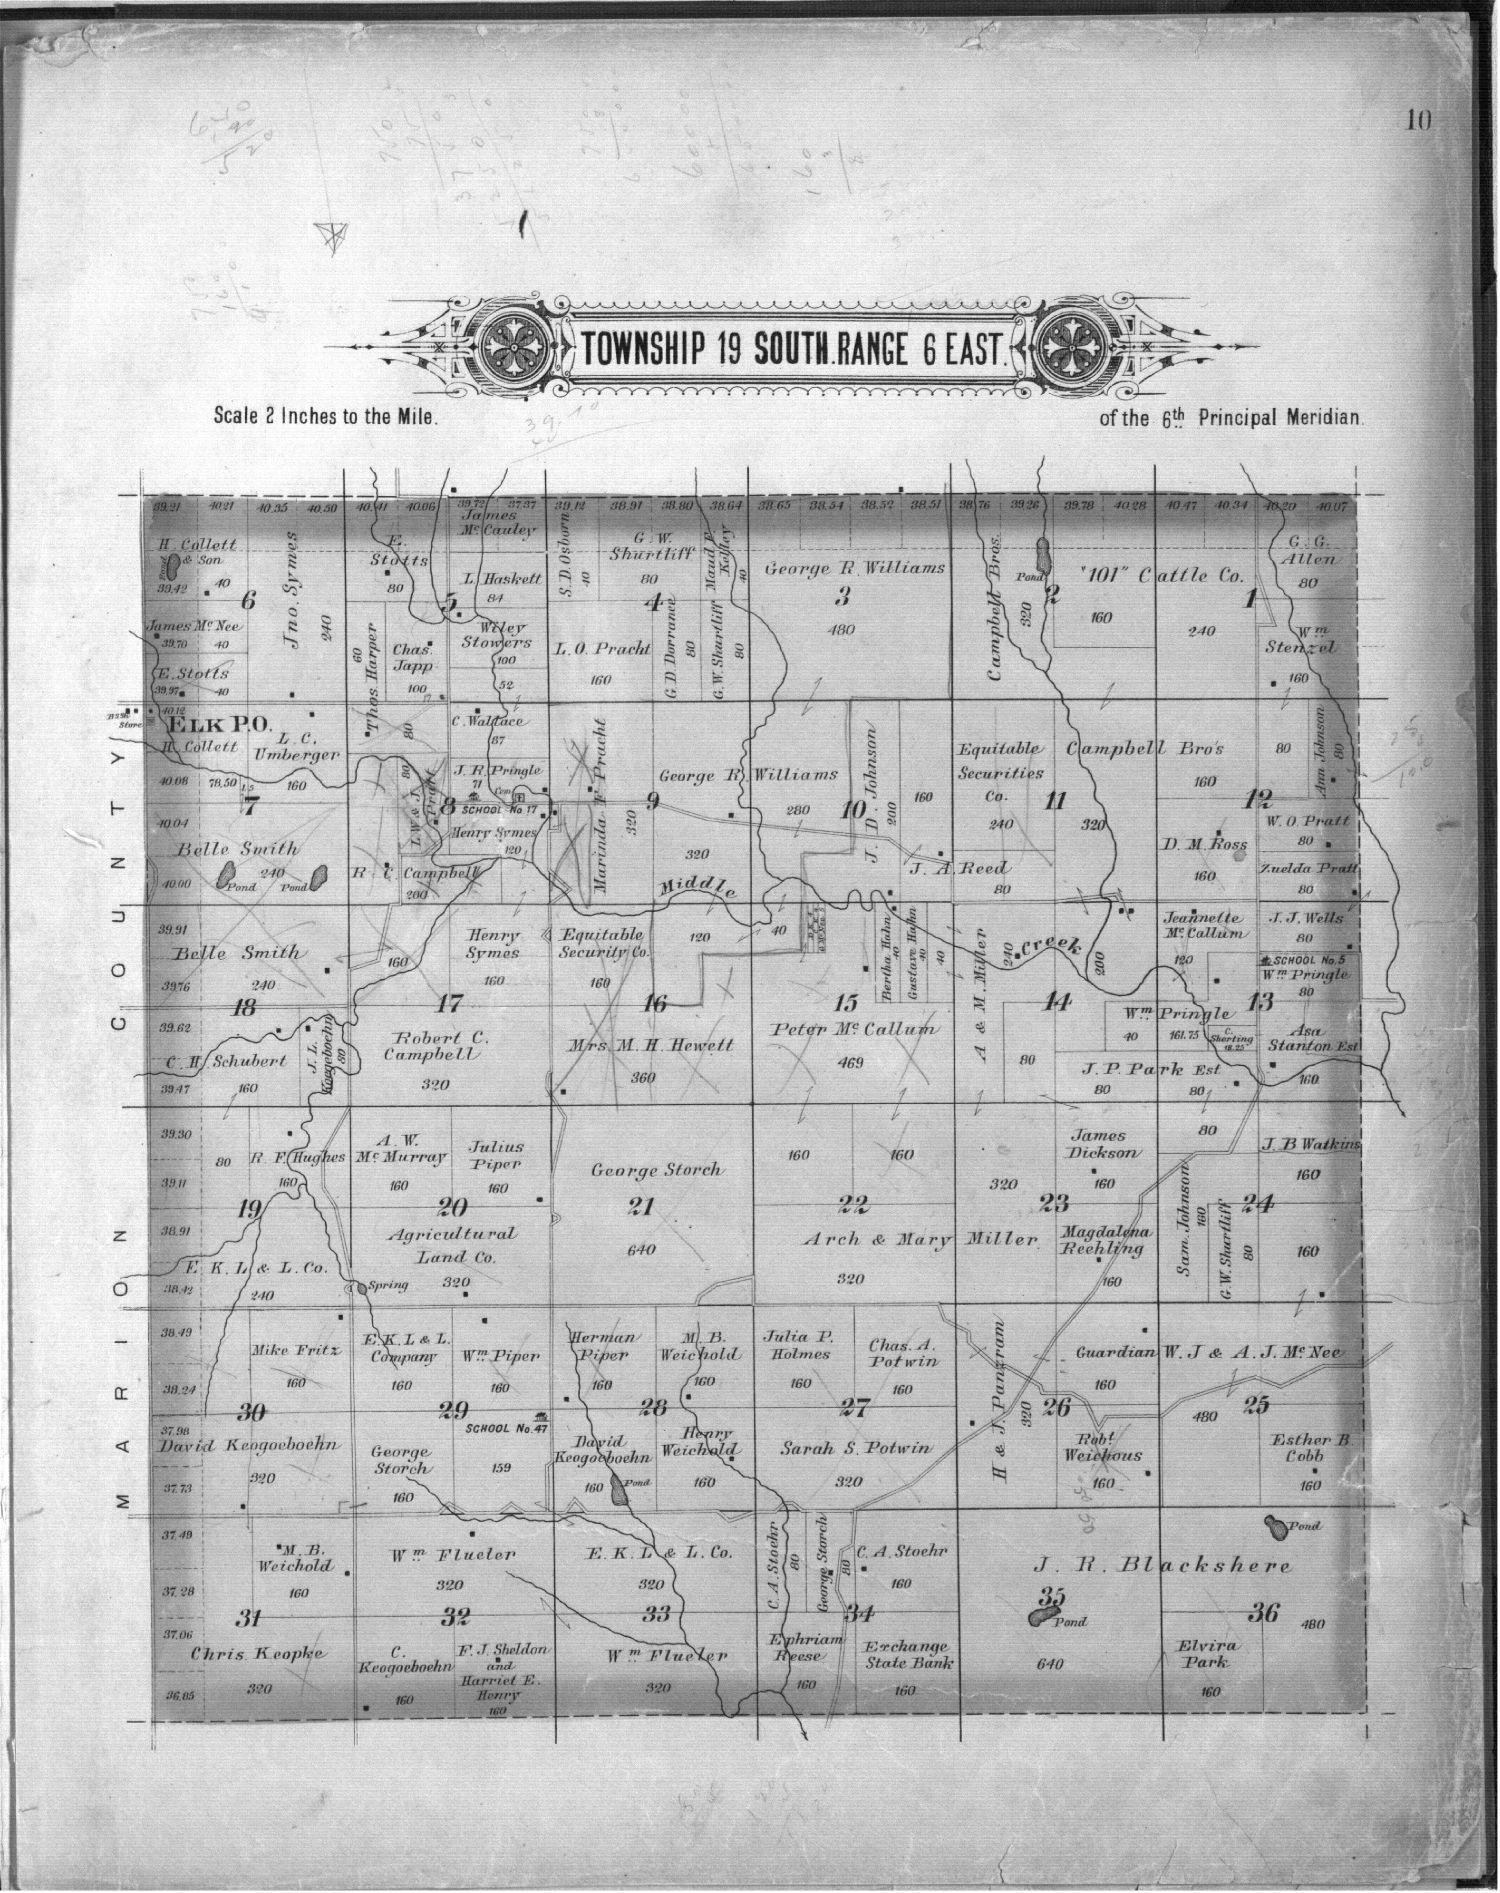 Plat book, Chase County, Kansas - 10